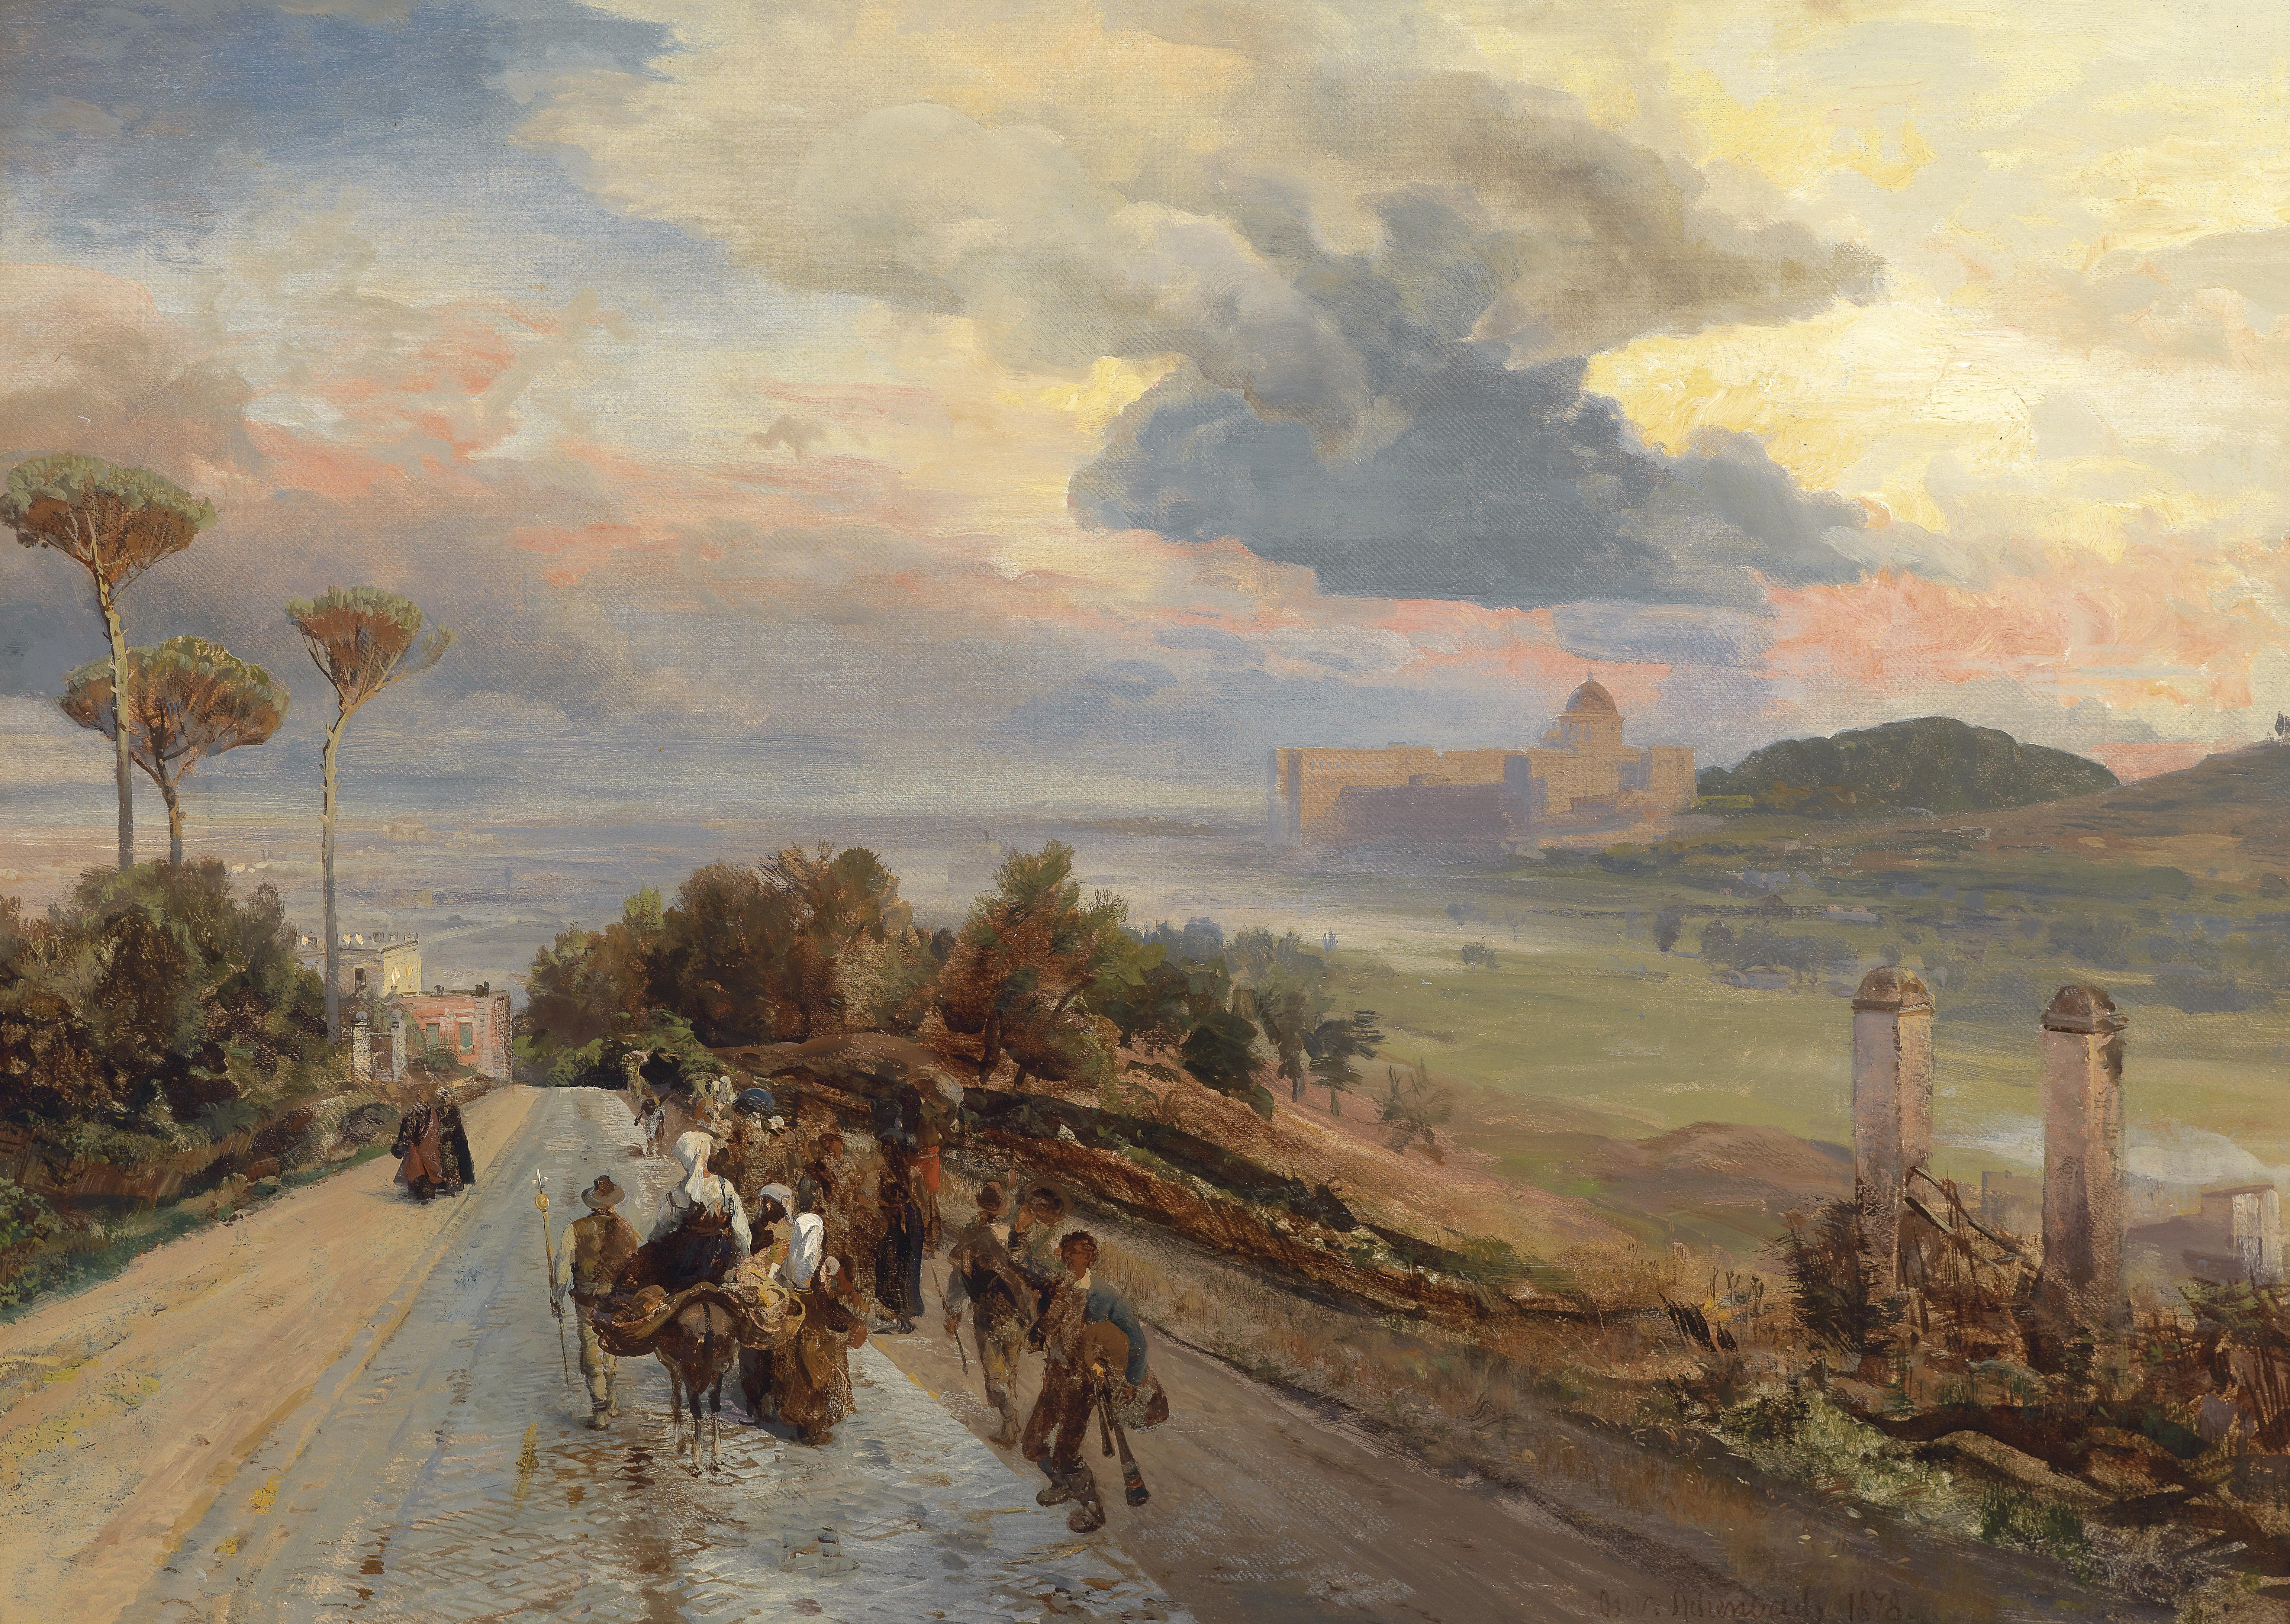 File:Oswald Achenbach Via Cassia bei Rom 1878.jpg.